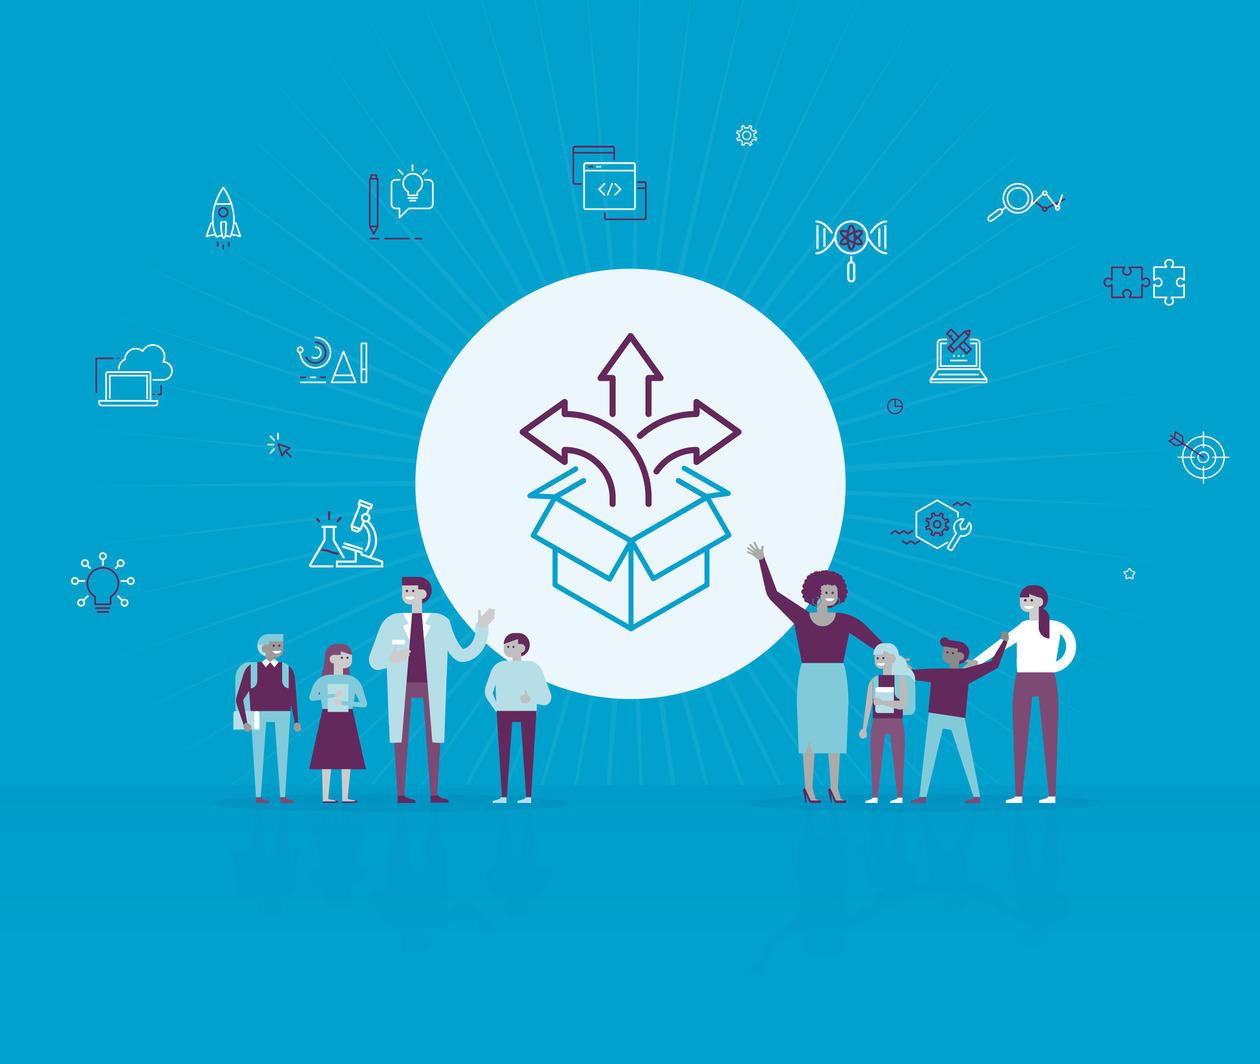 Inspiring Young People in STEM: Communication Skills for STEM Ambassadors